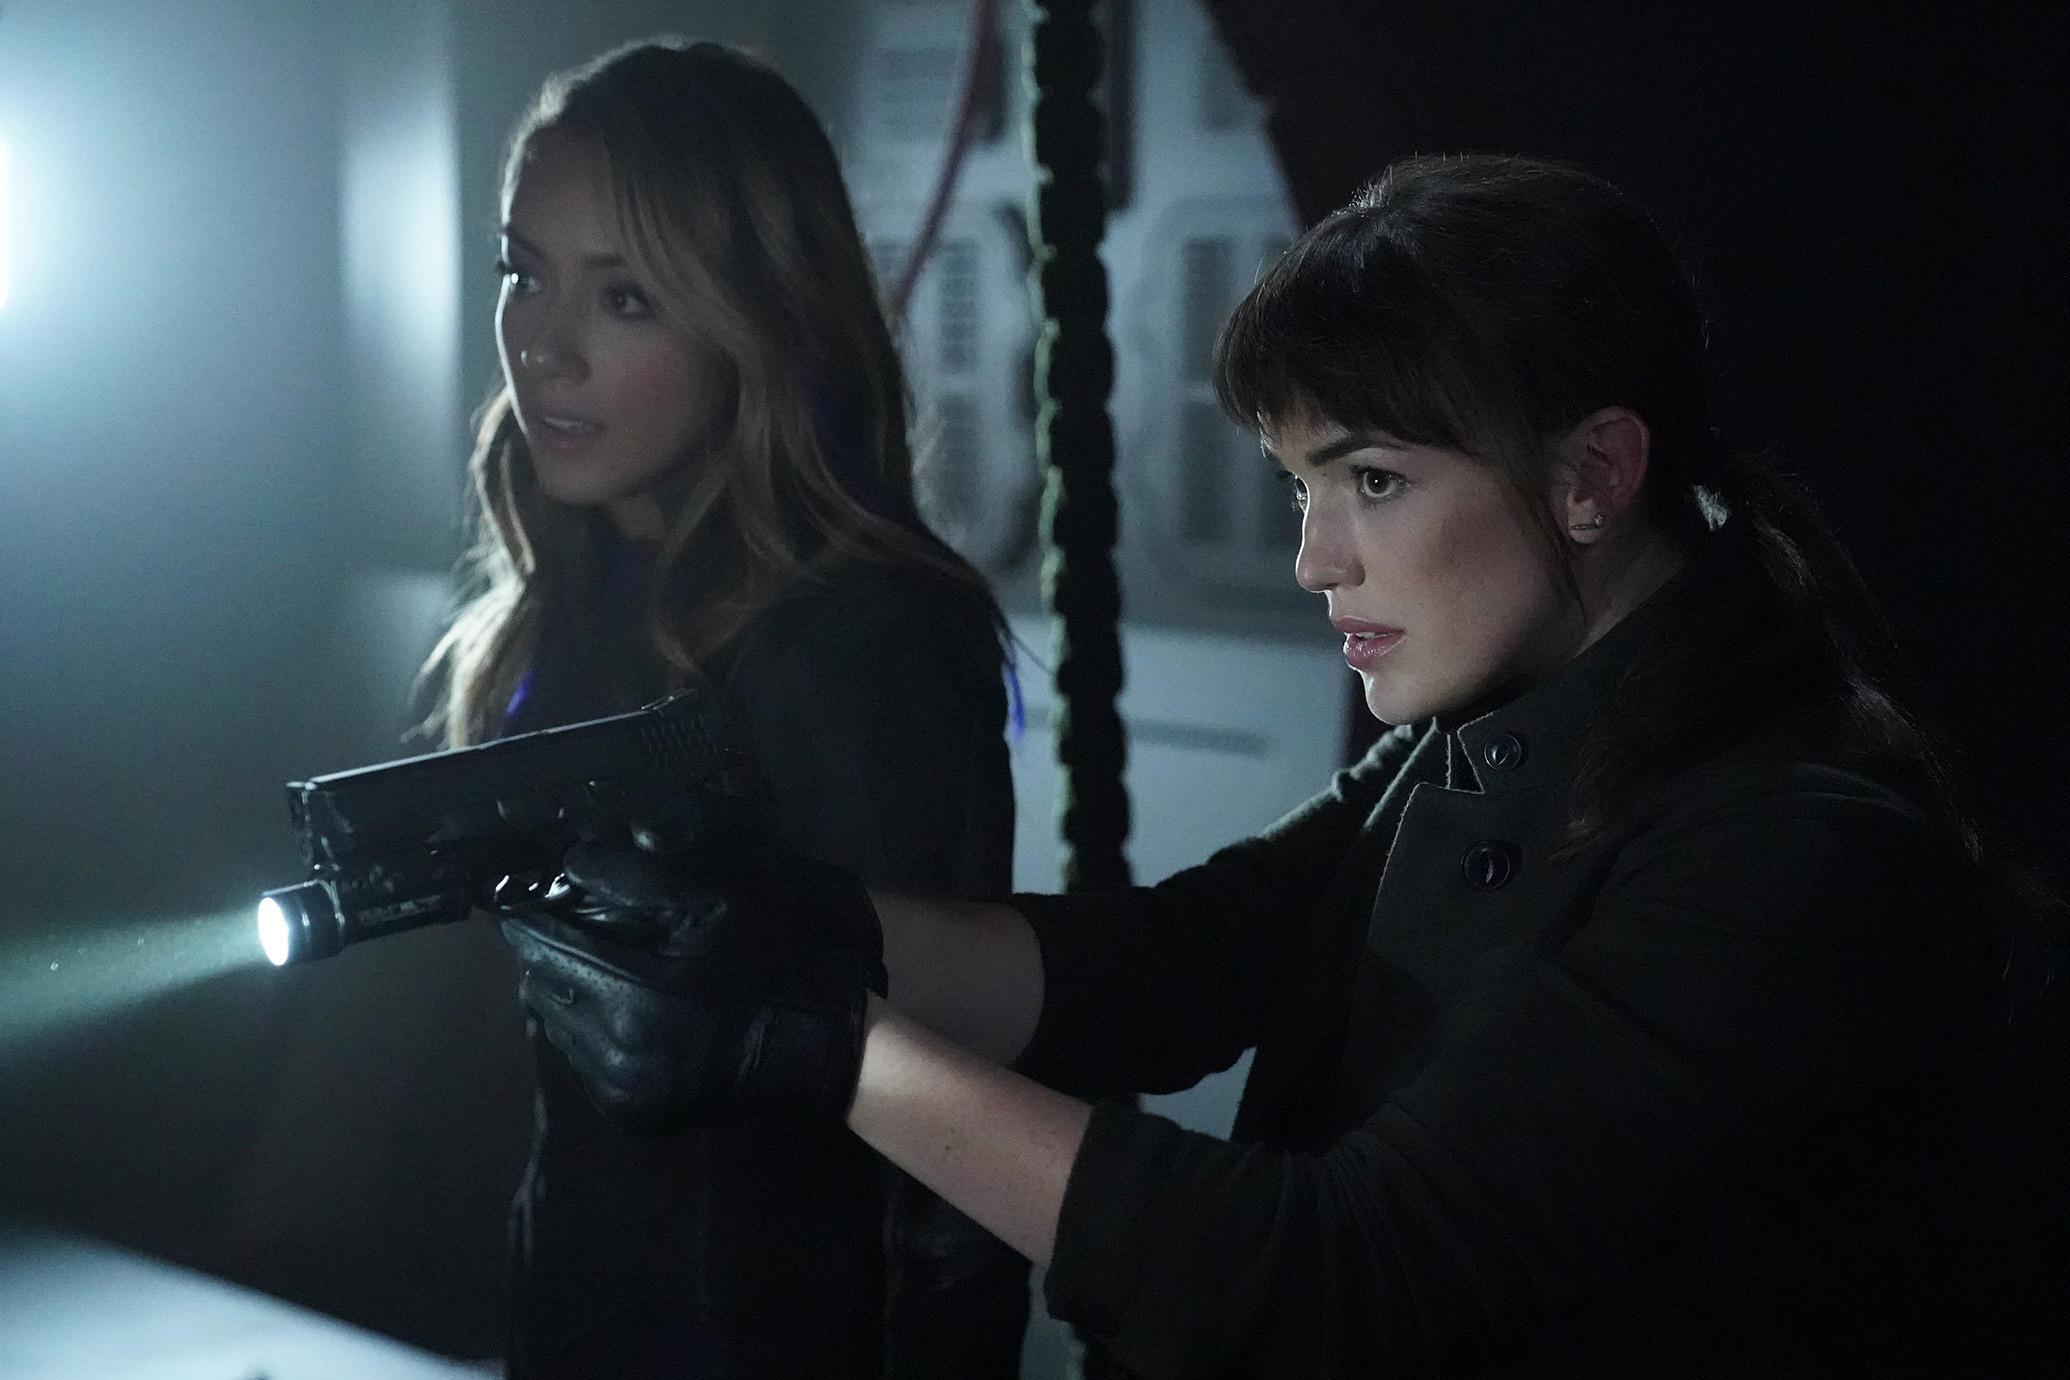 agents of shield season 2 episode 9 coke and popcorn